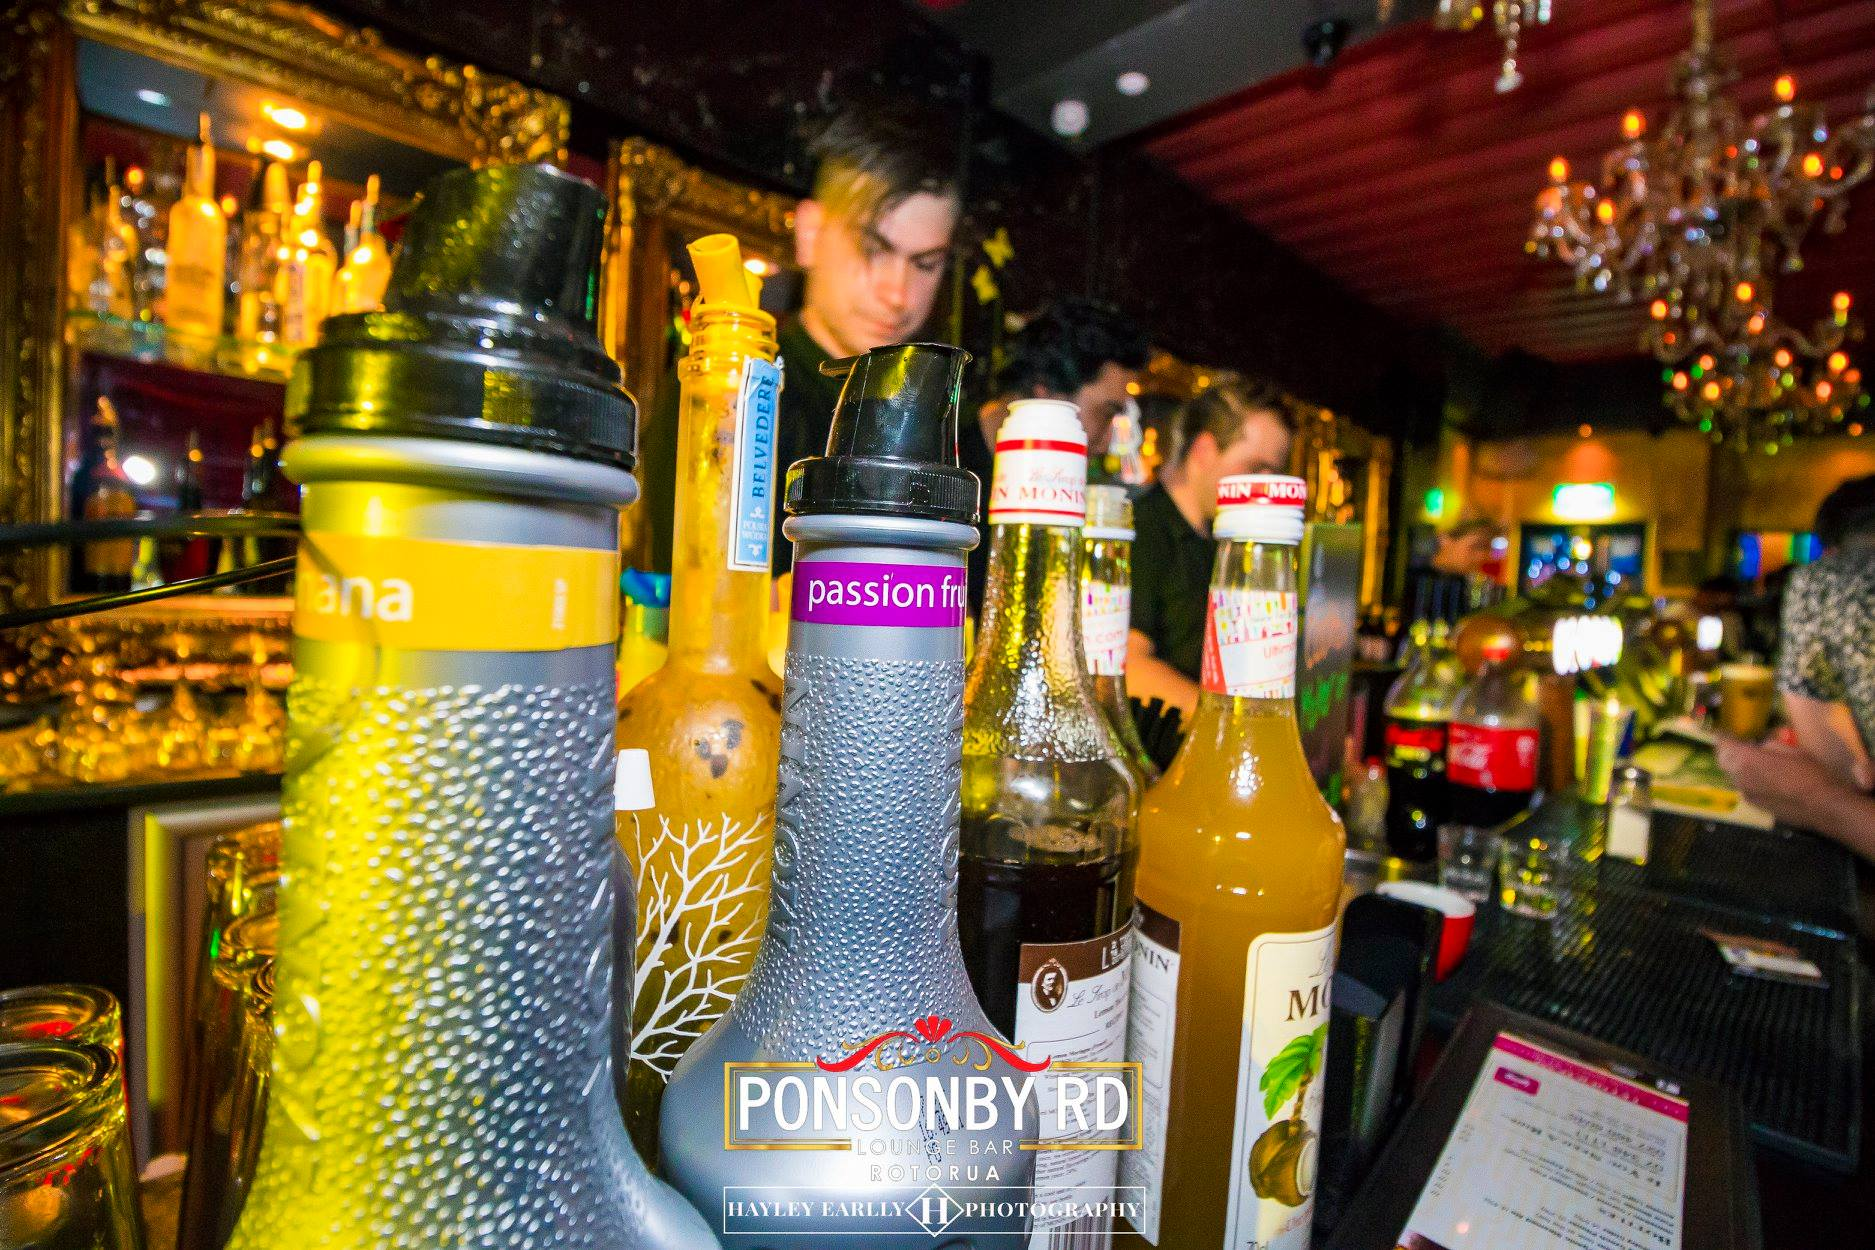 Ponsonby Rd Lounge Bar